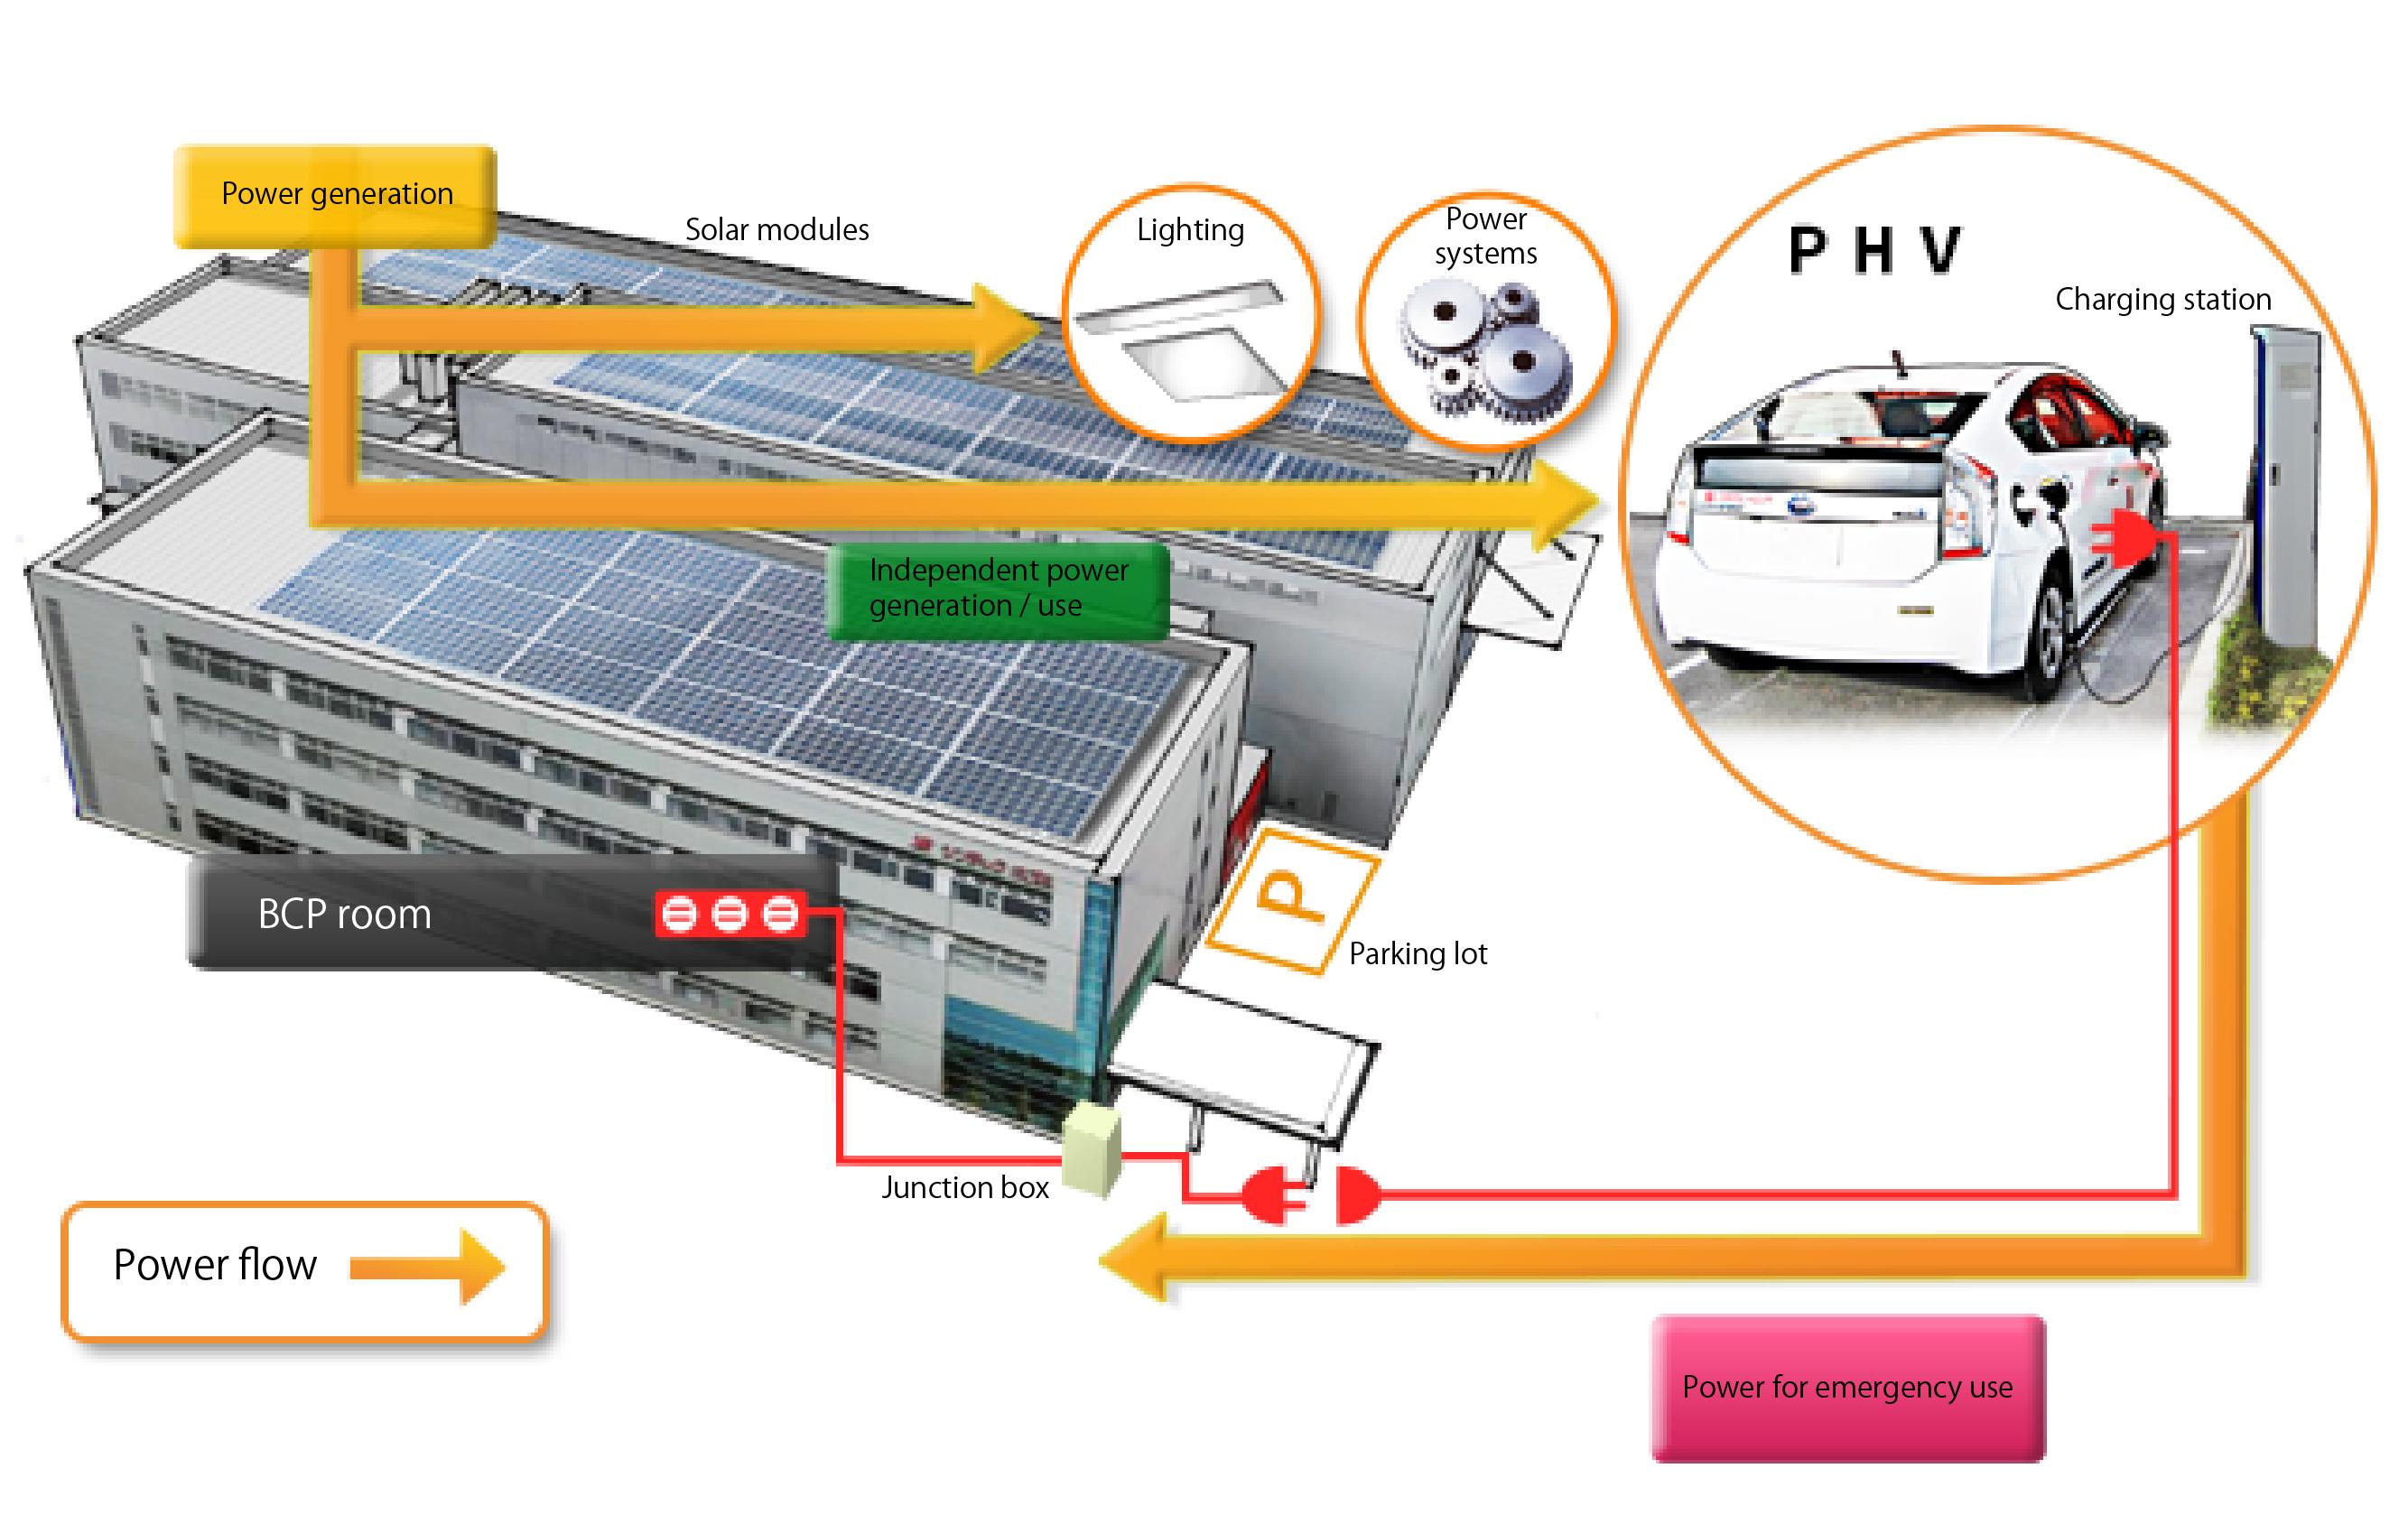 KYOCERA Corporation (Japan) Hina Morioka, +81-(0)75-604-3416. Corporate  Communications webmaster.pressgl@kyocera.jp. Fax: +81-(0)75-604-3516